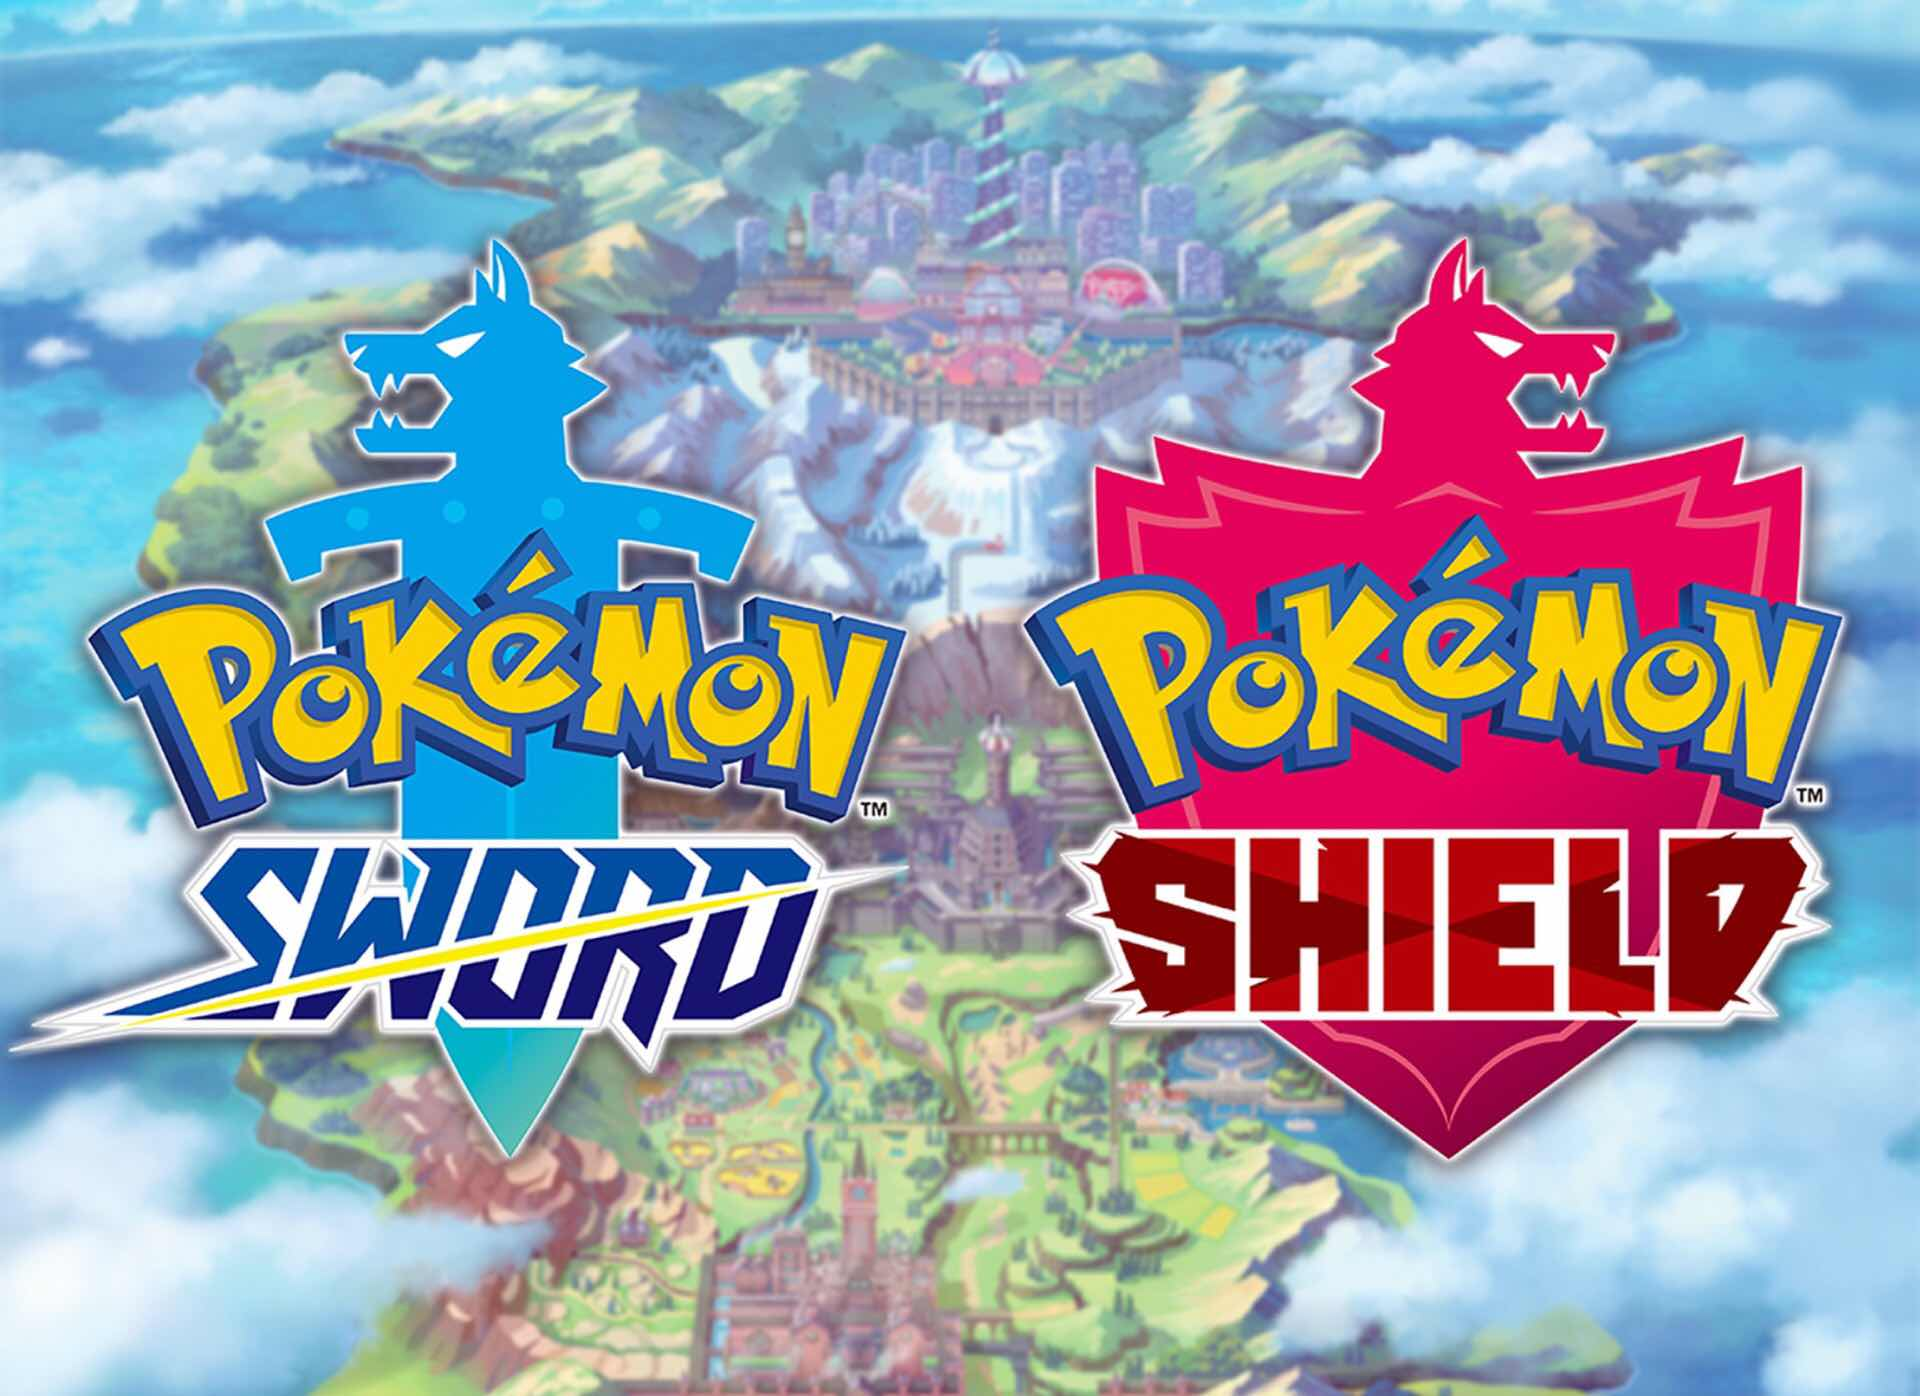 New Pokemon Sword & Shield Japanese Trailer Shows Zacian & Zamazenta Signatures